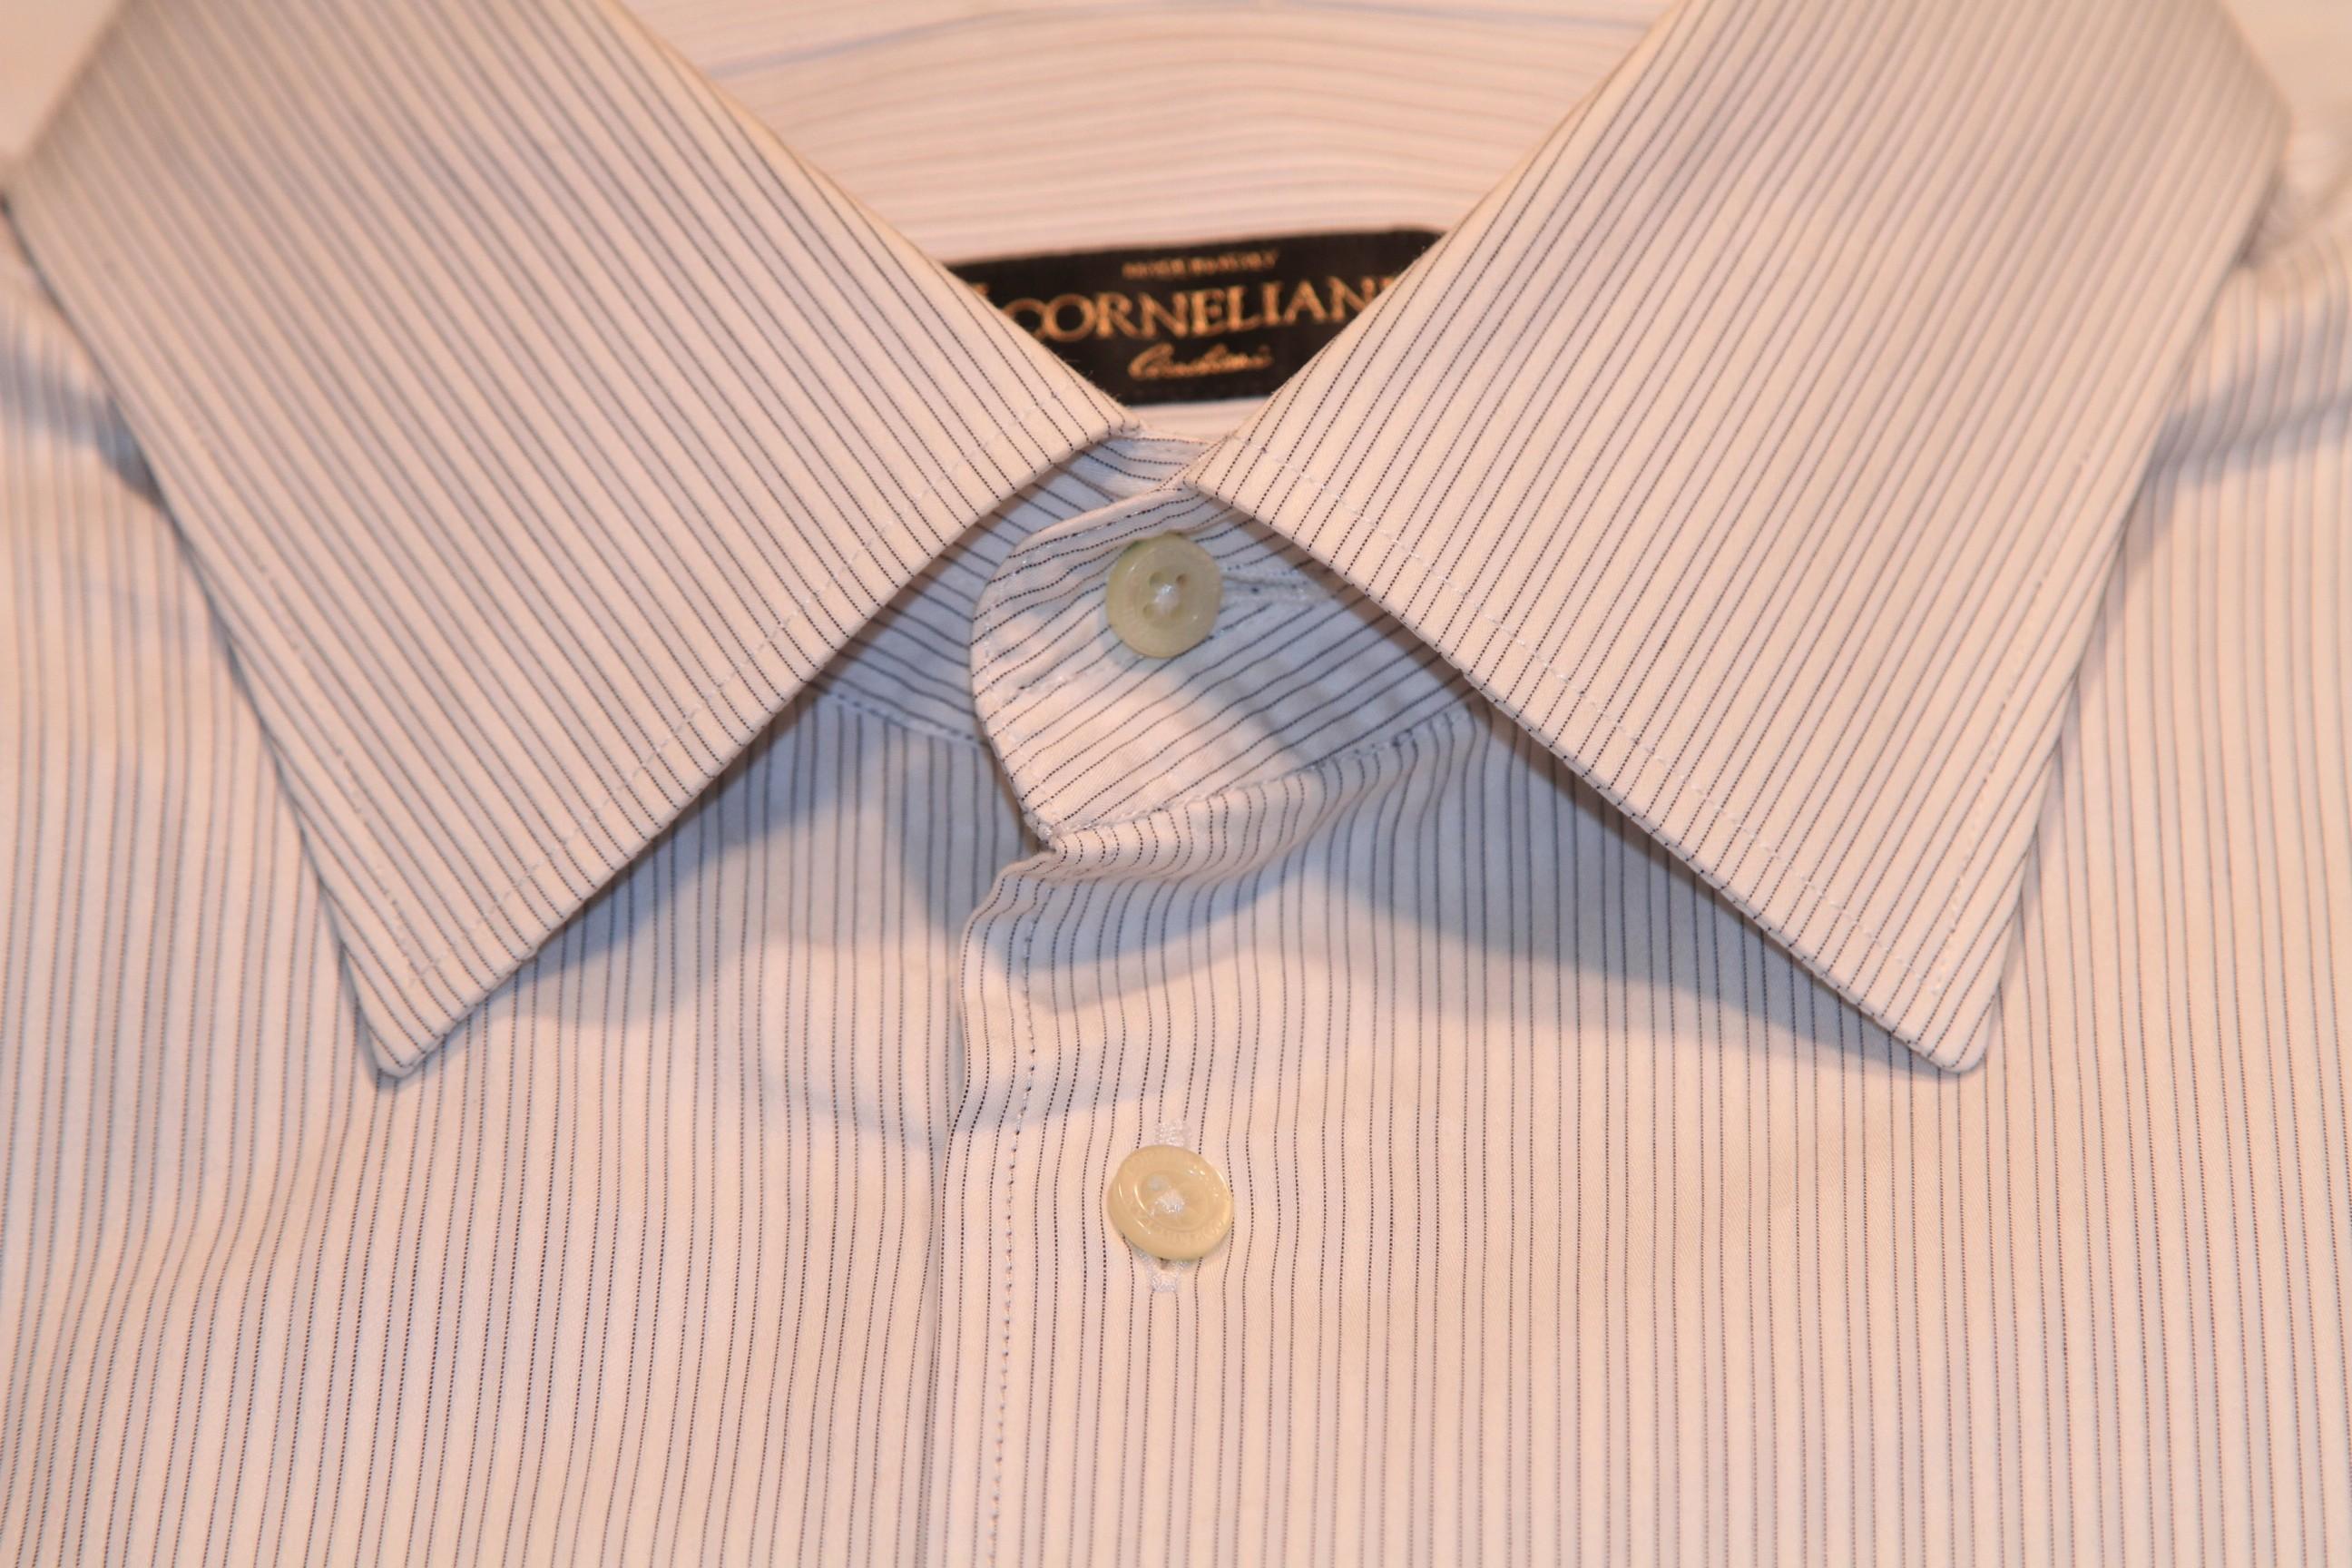 #19 - Corneliani 42/16.5 Light Silver with Light Silver Stripe